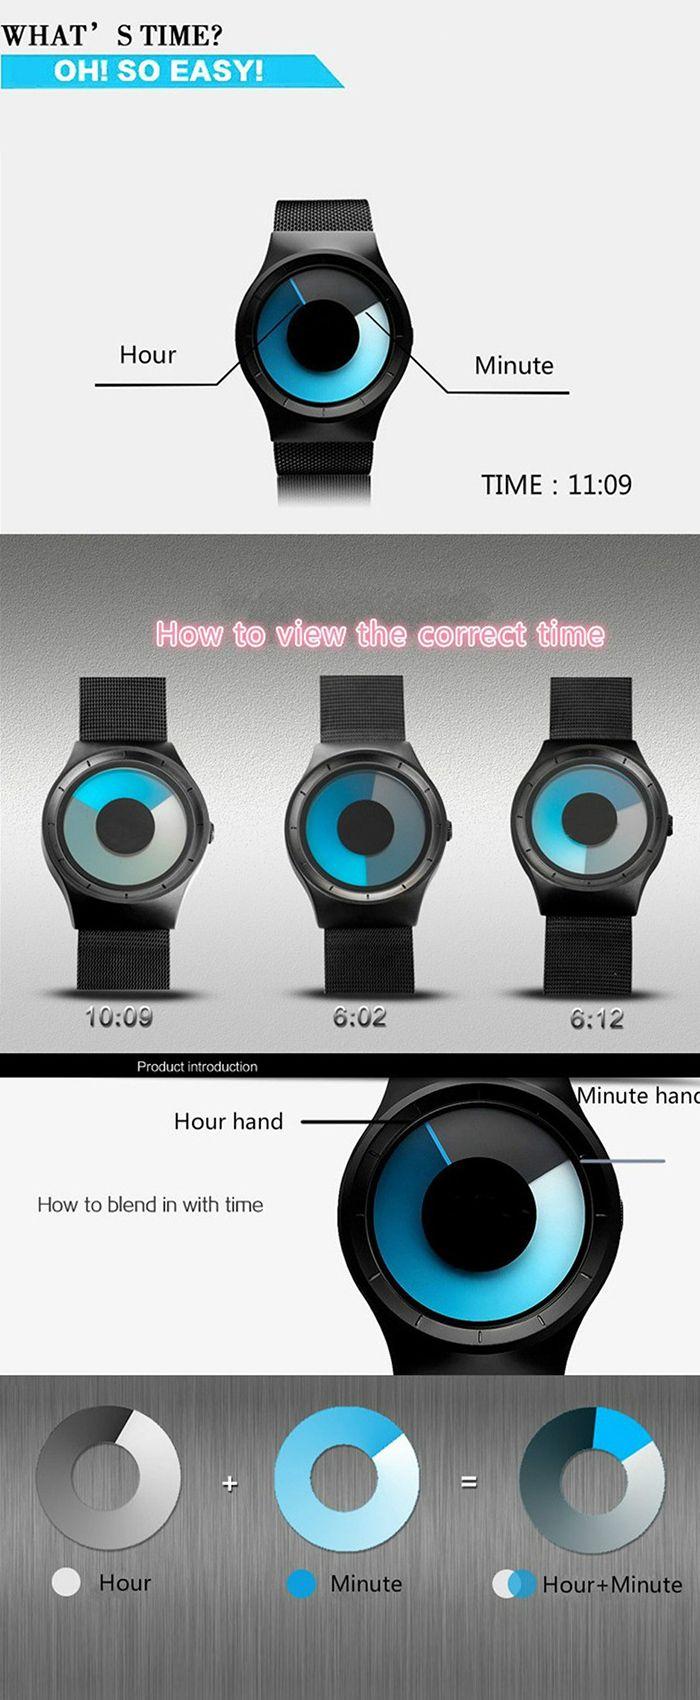 Alloy Strap Vortex Ombre Quartz Watch